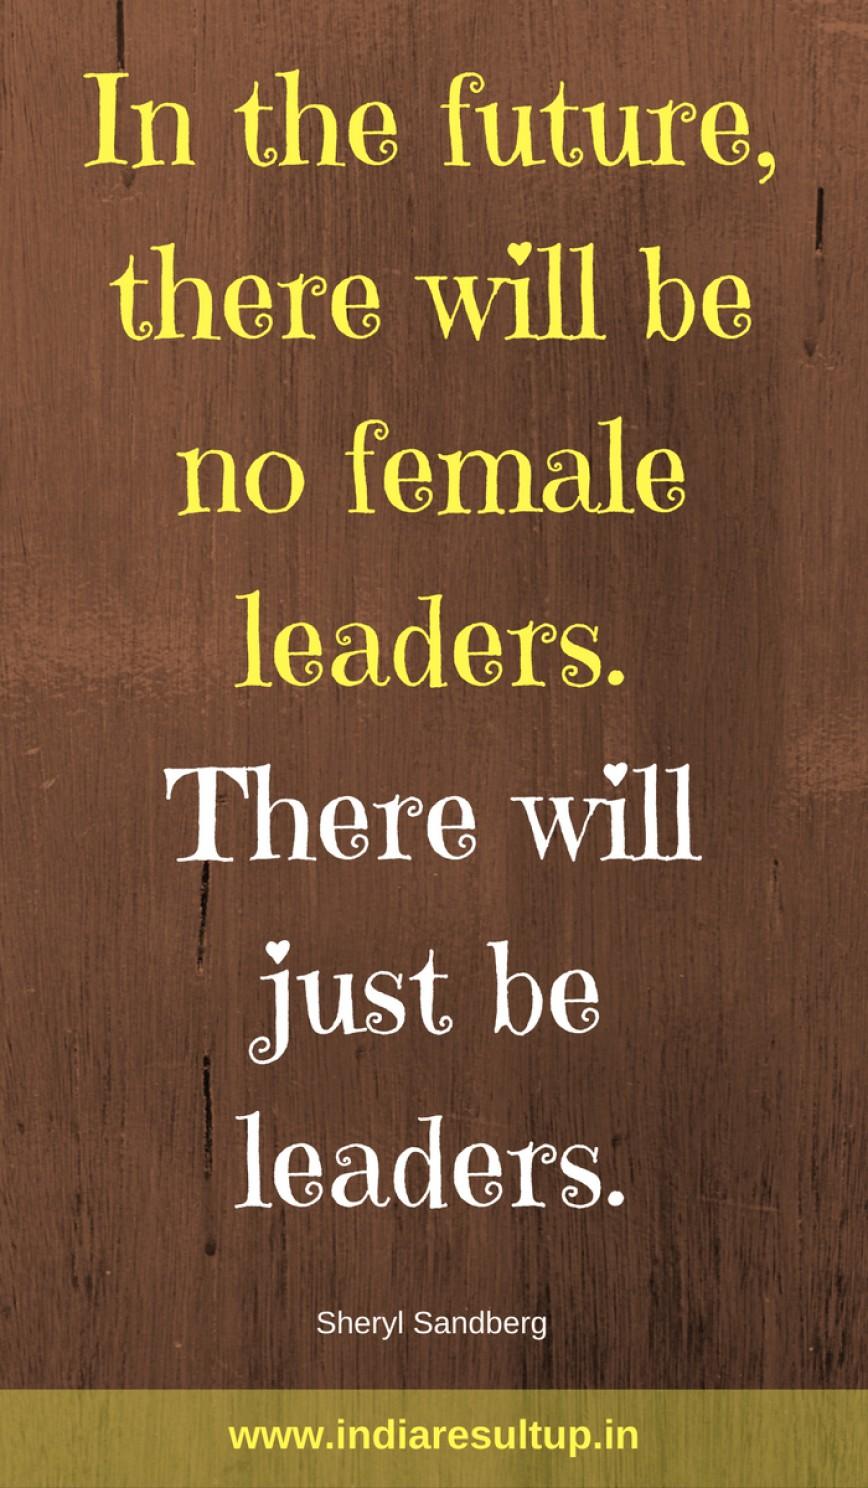 010 Women Empowerment Essay Exceptional Pdf